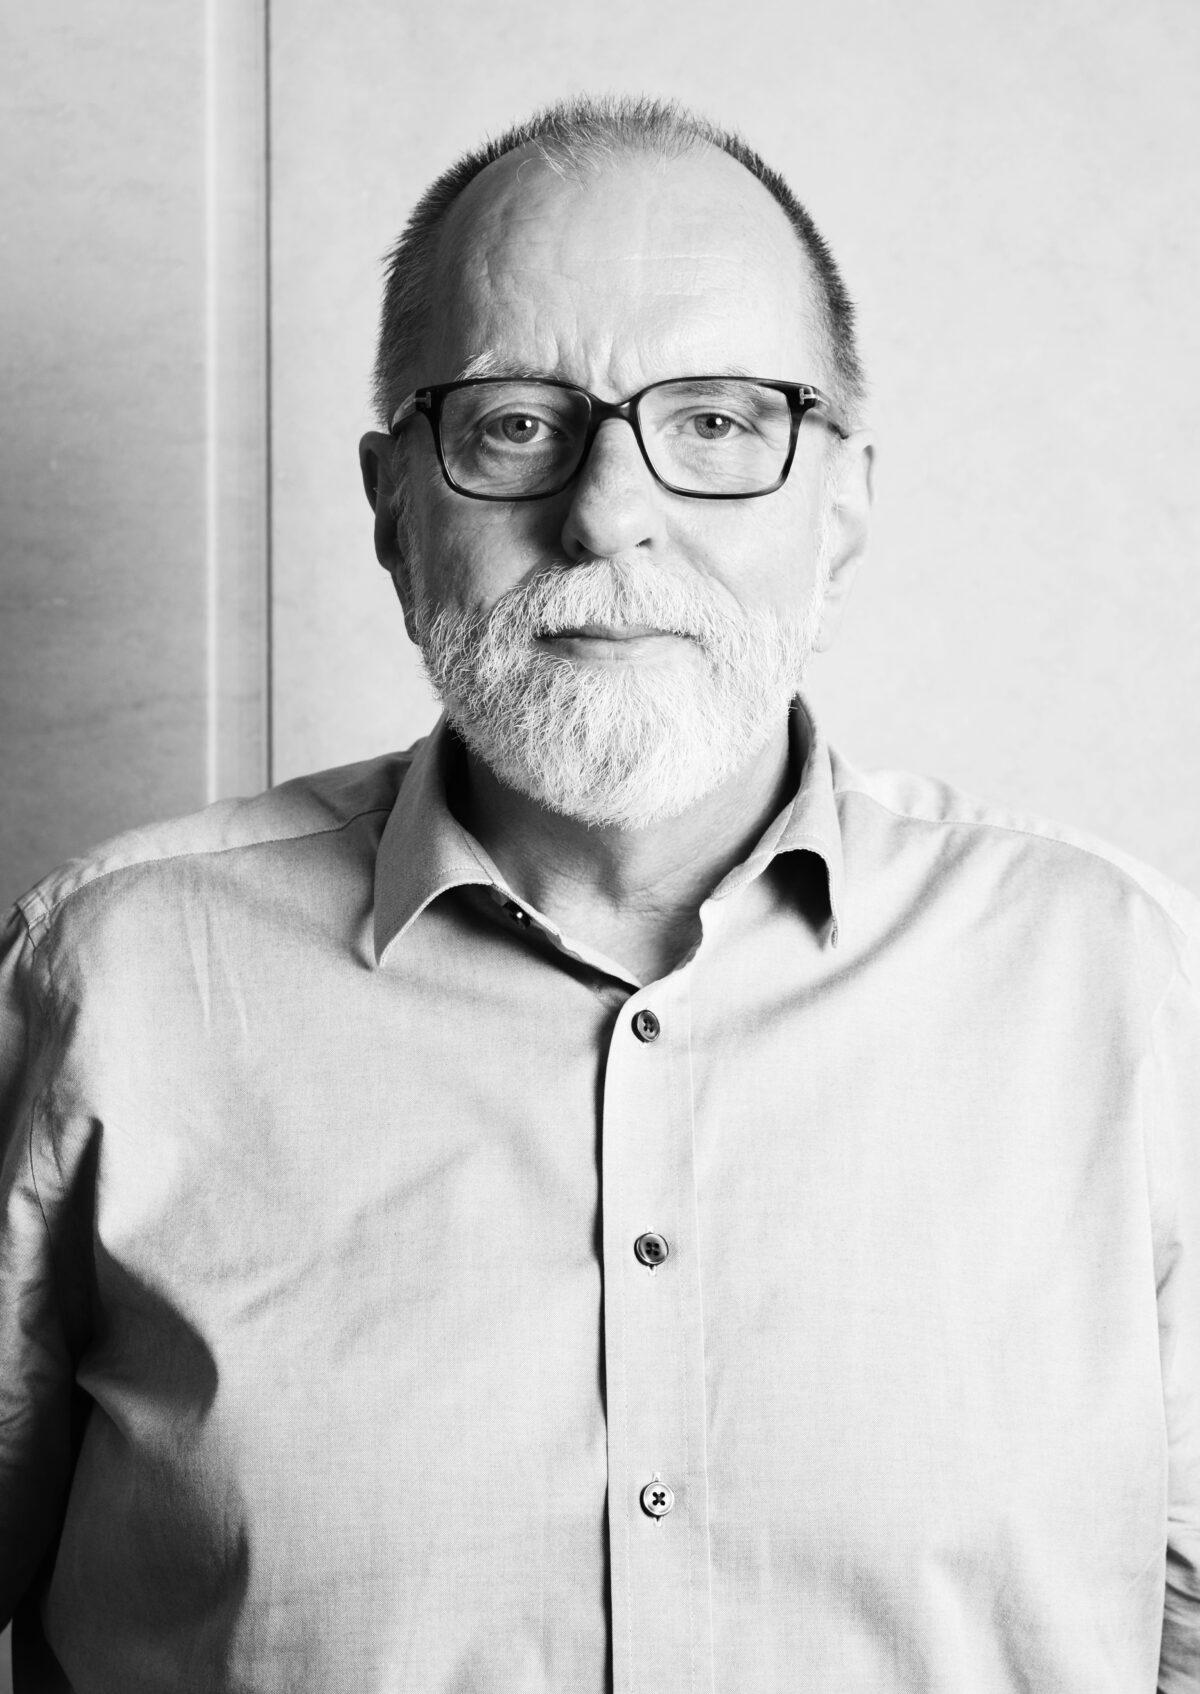 Lars Strömqvist